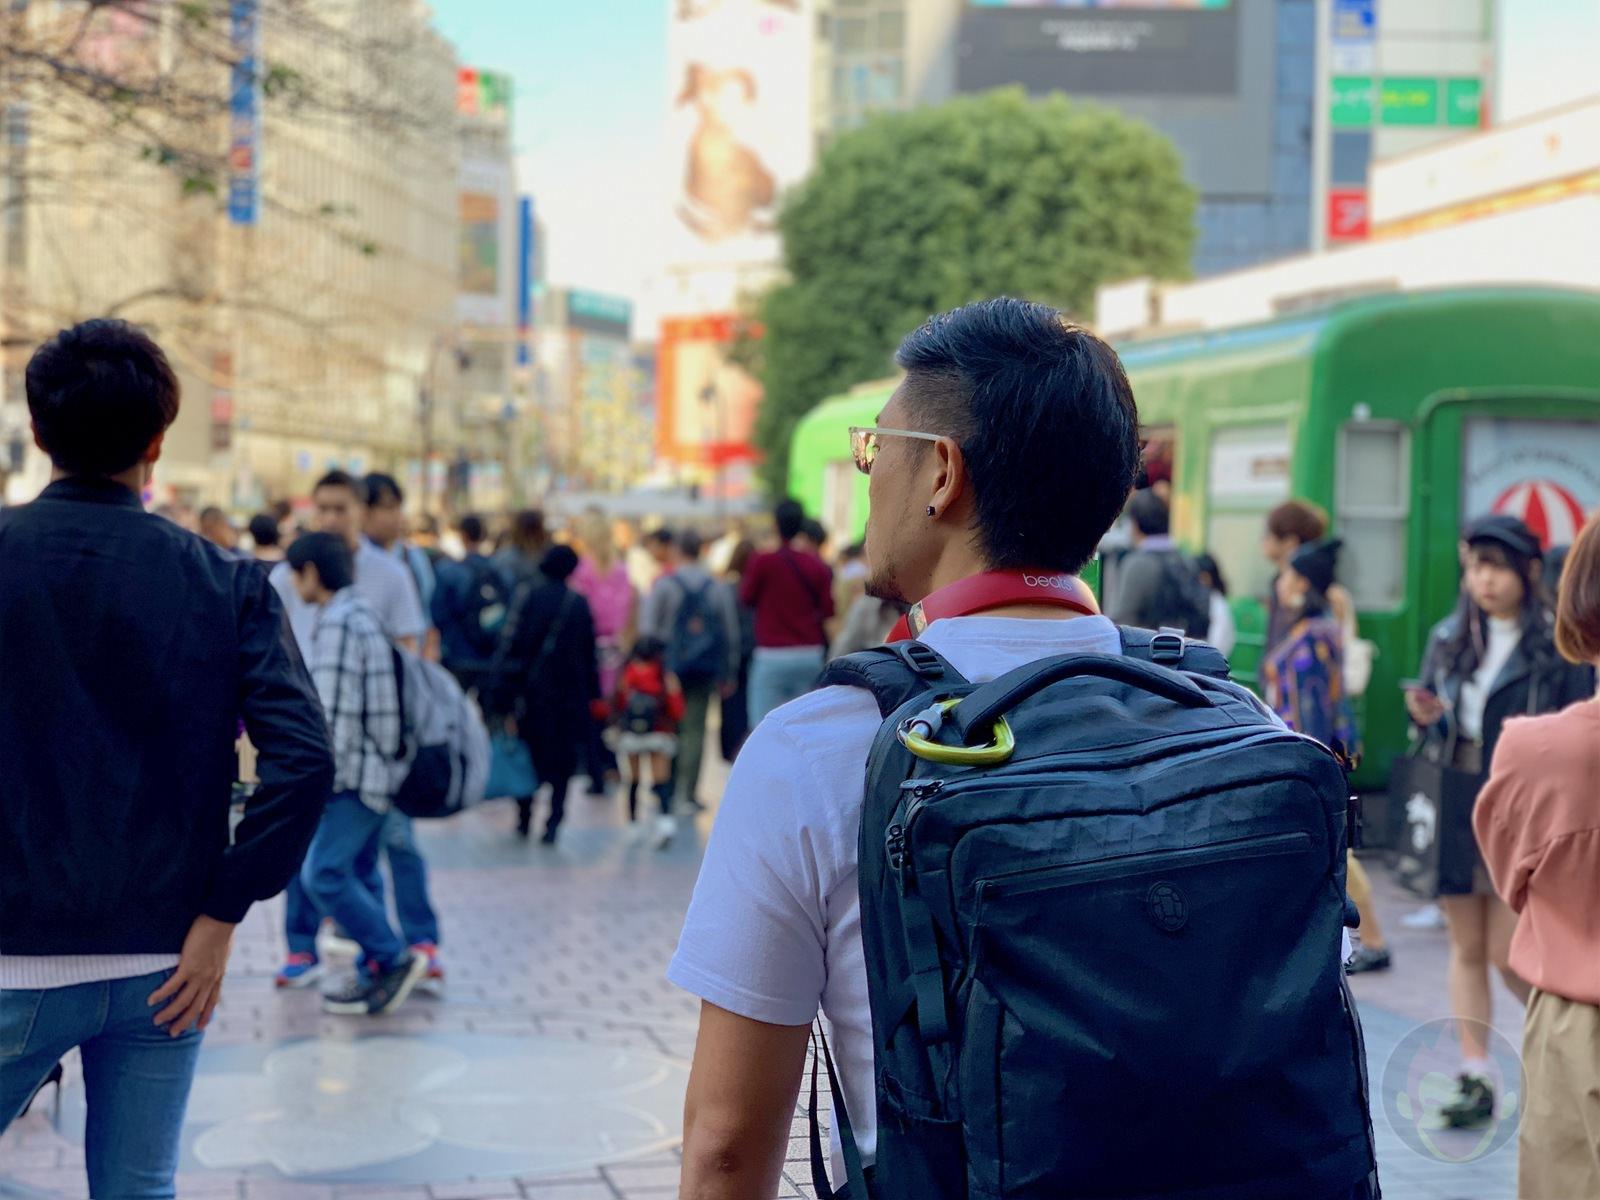 White-Tshirt-Questionare-at-Shibuya-Harajuku-16.jpg